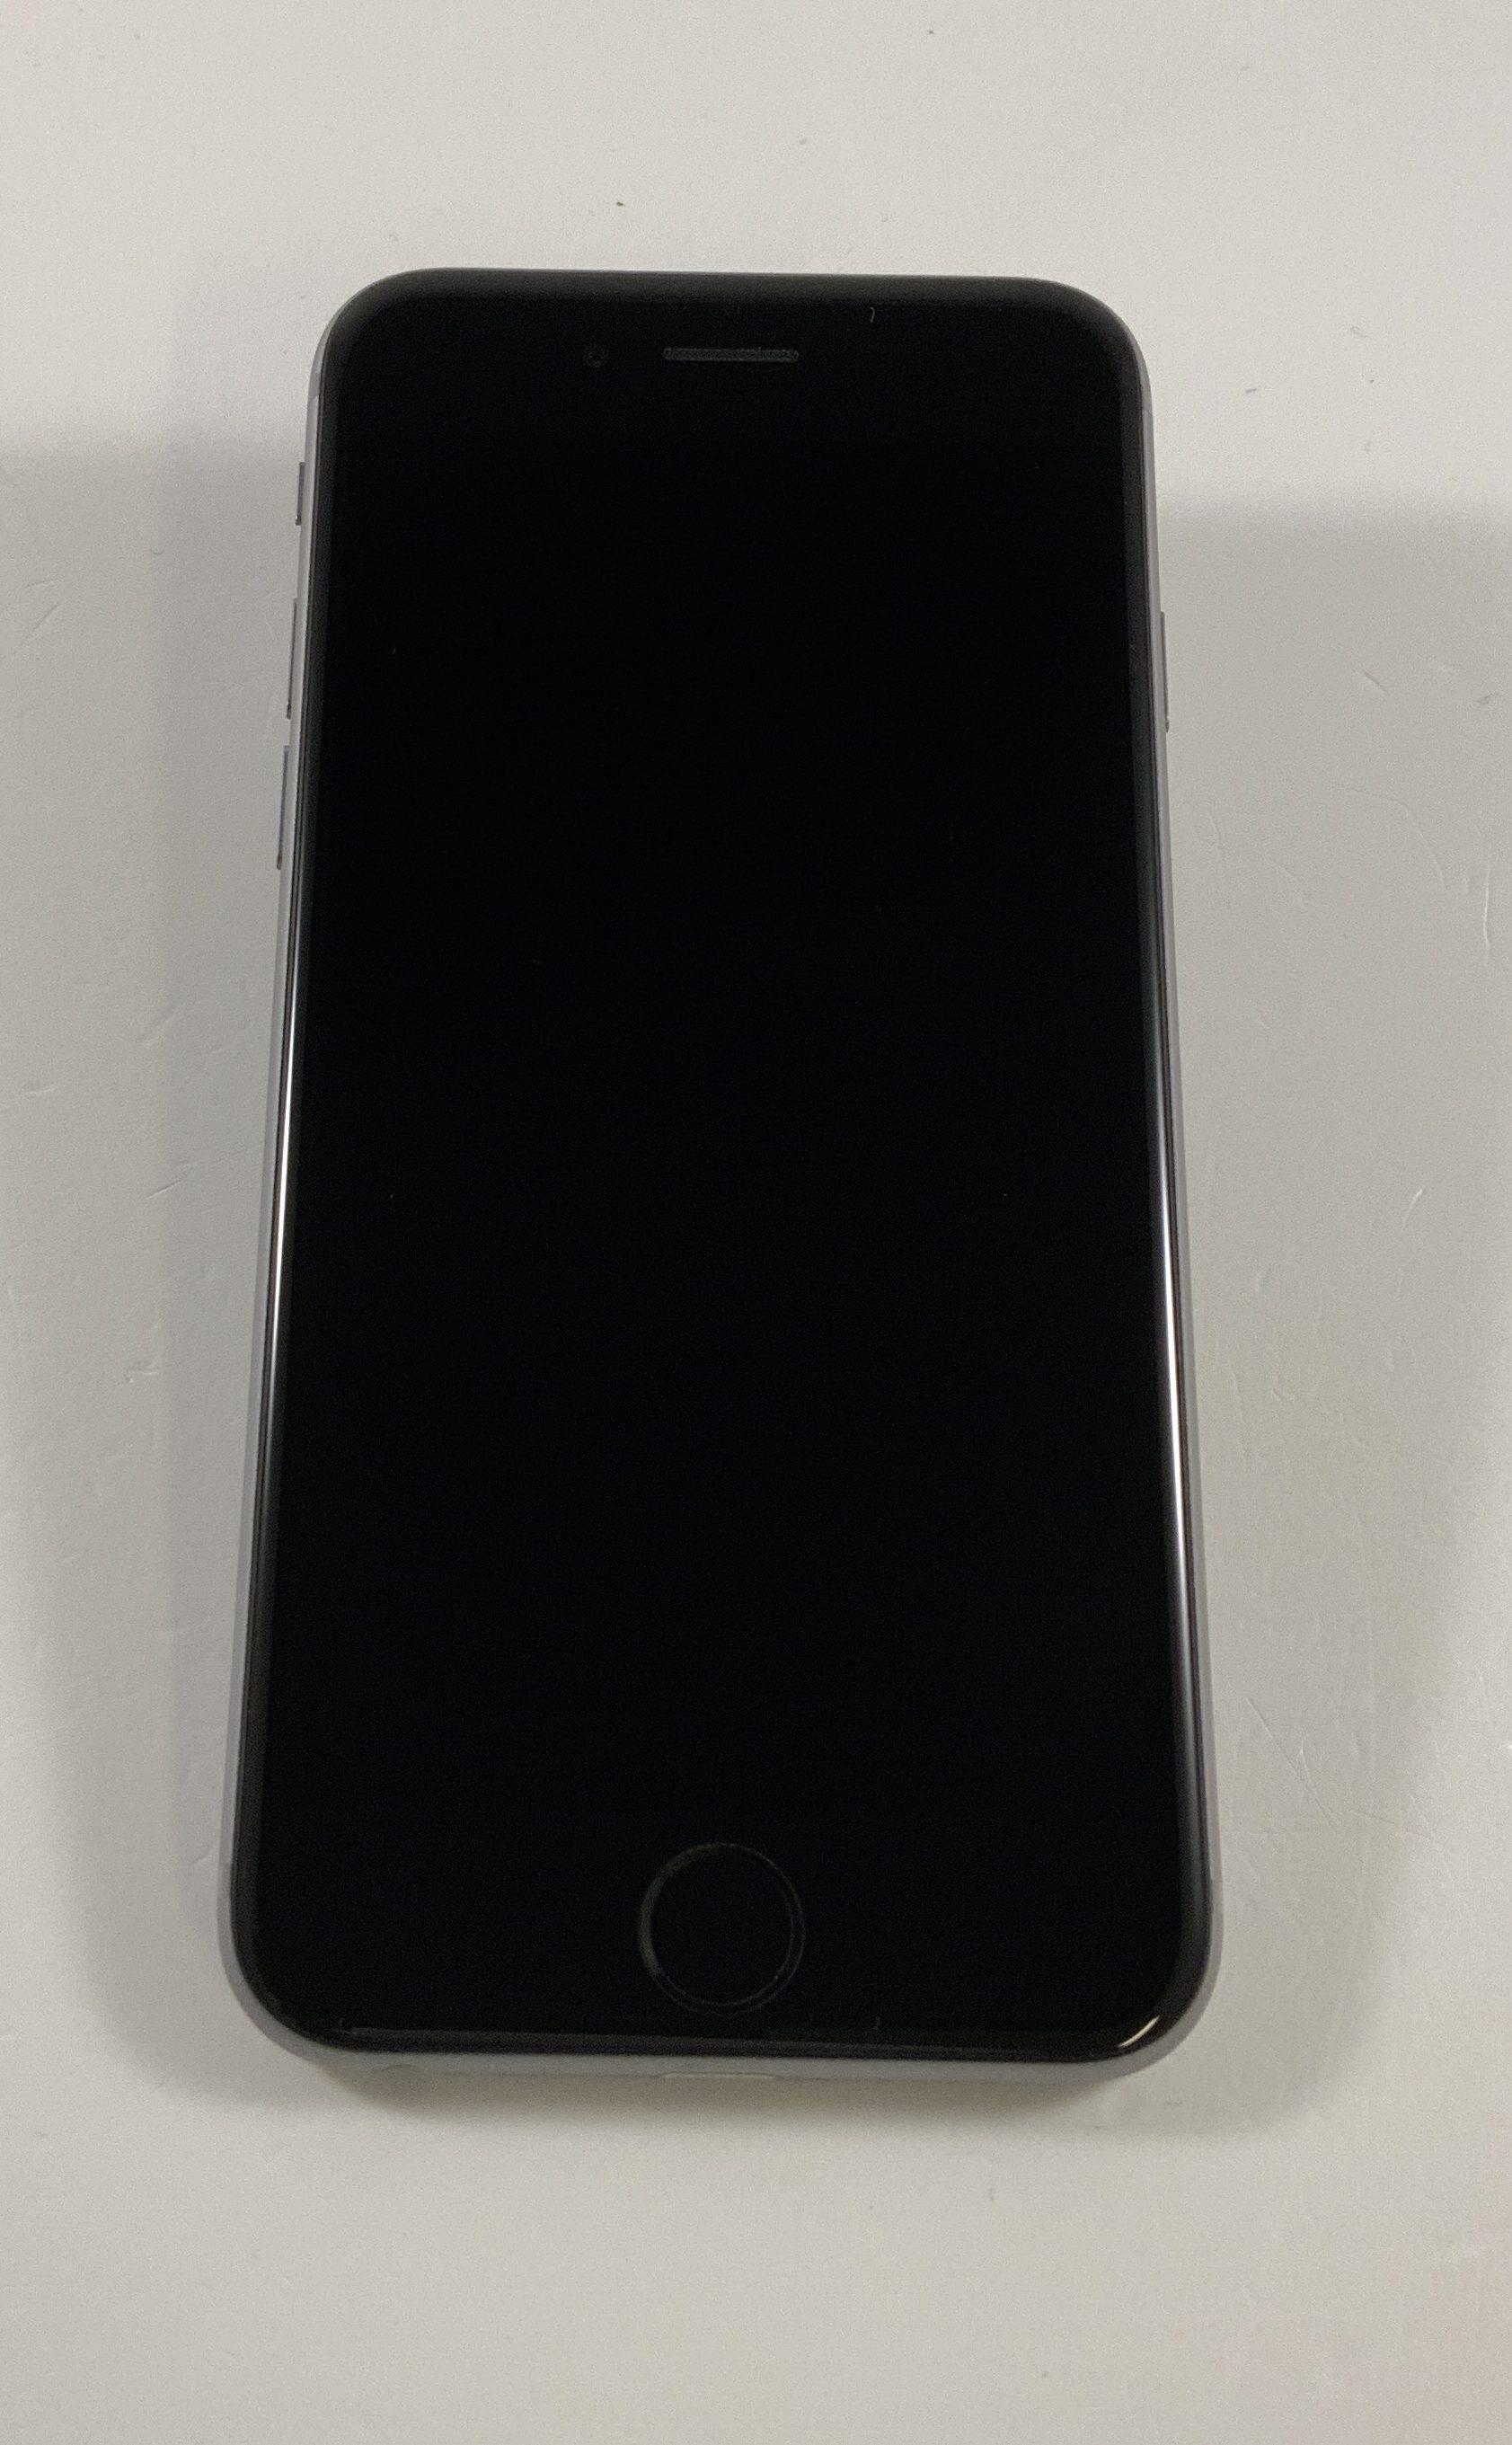 iPhone 6S 64GB, 64GB, Space Gray, immagine 1